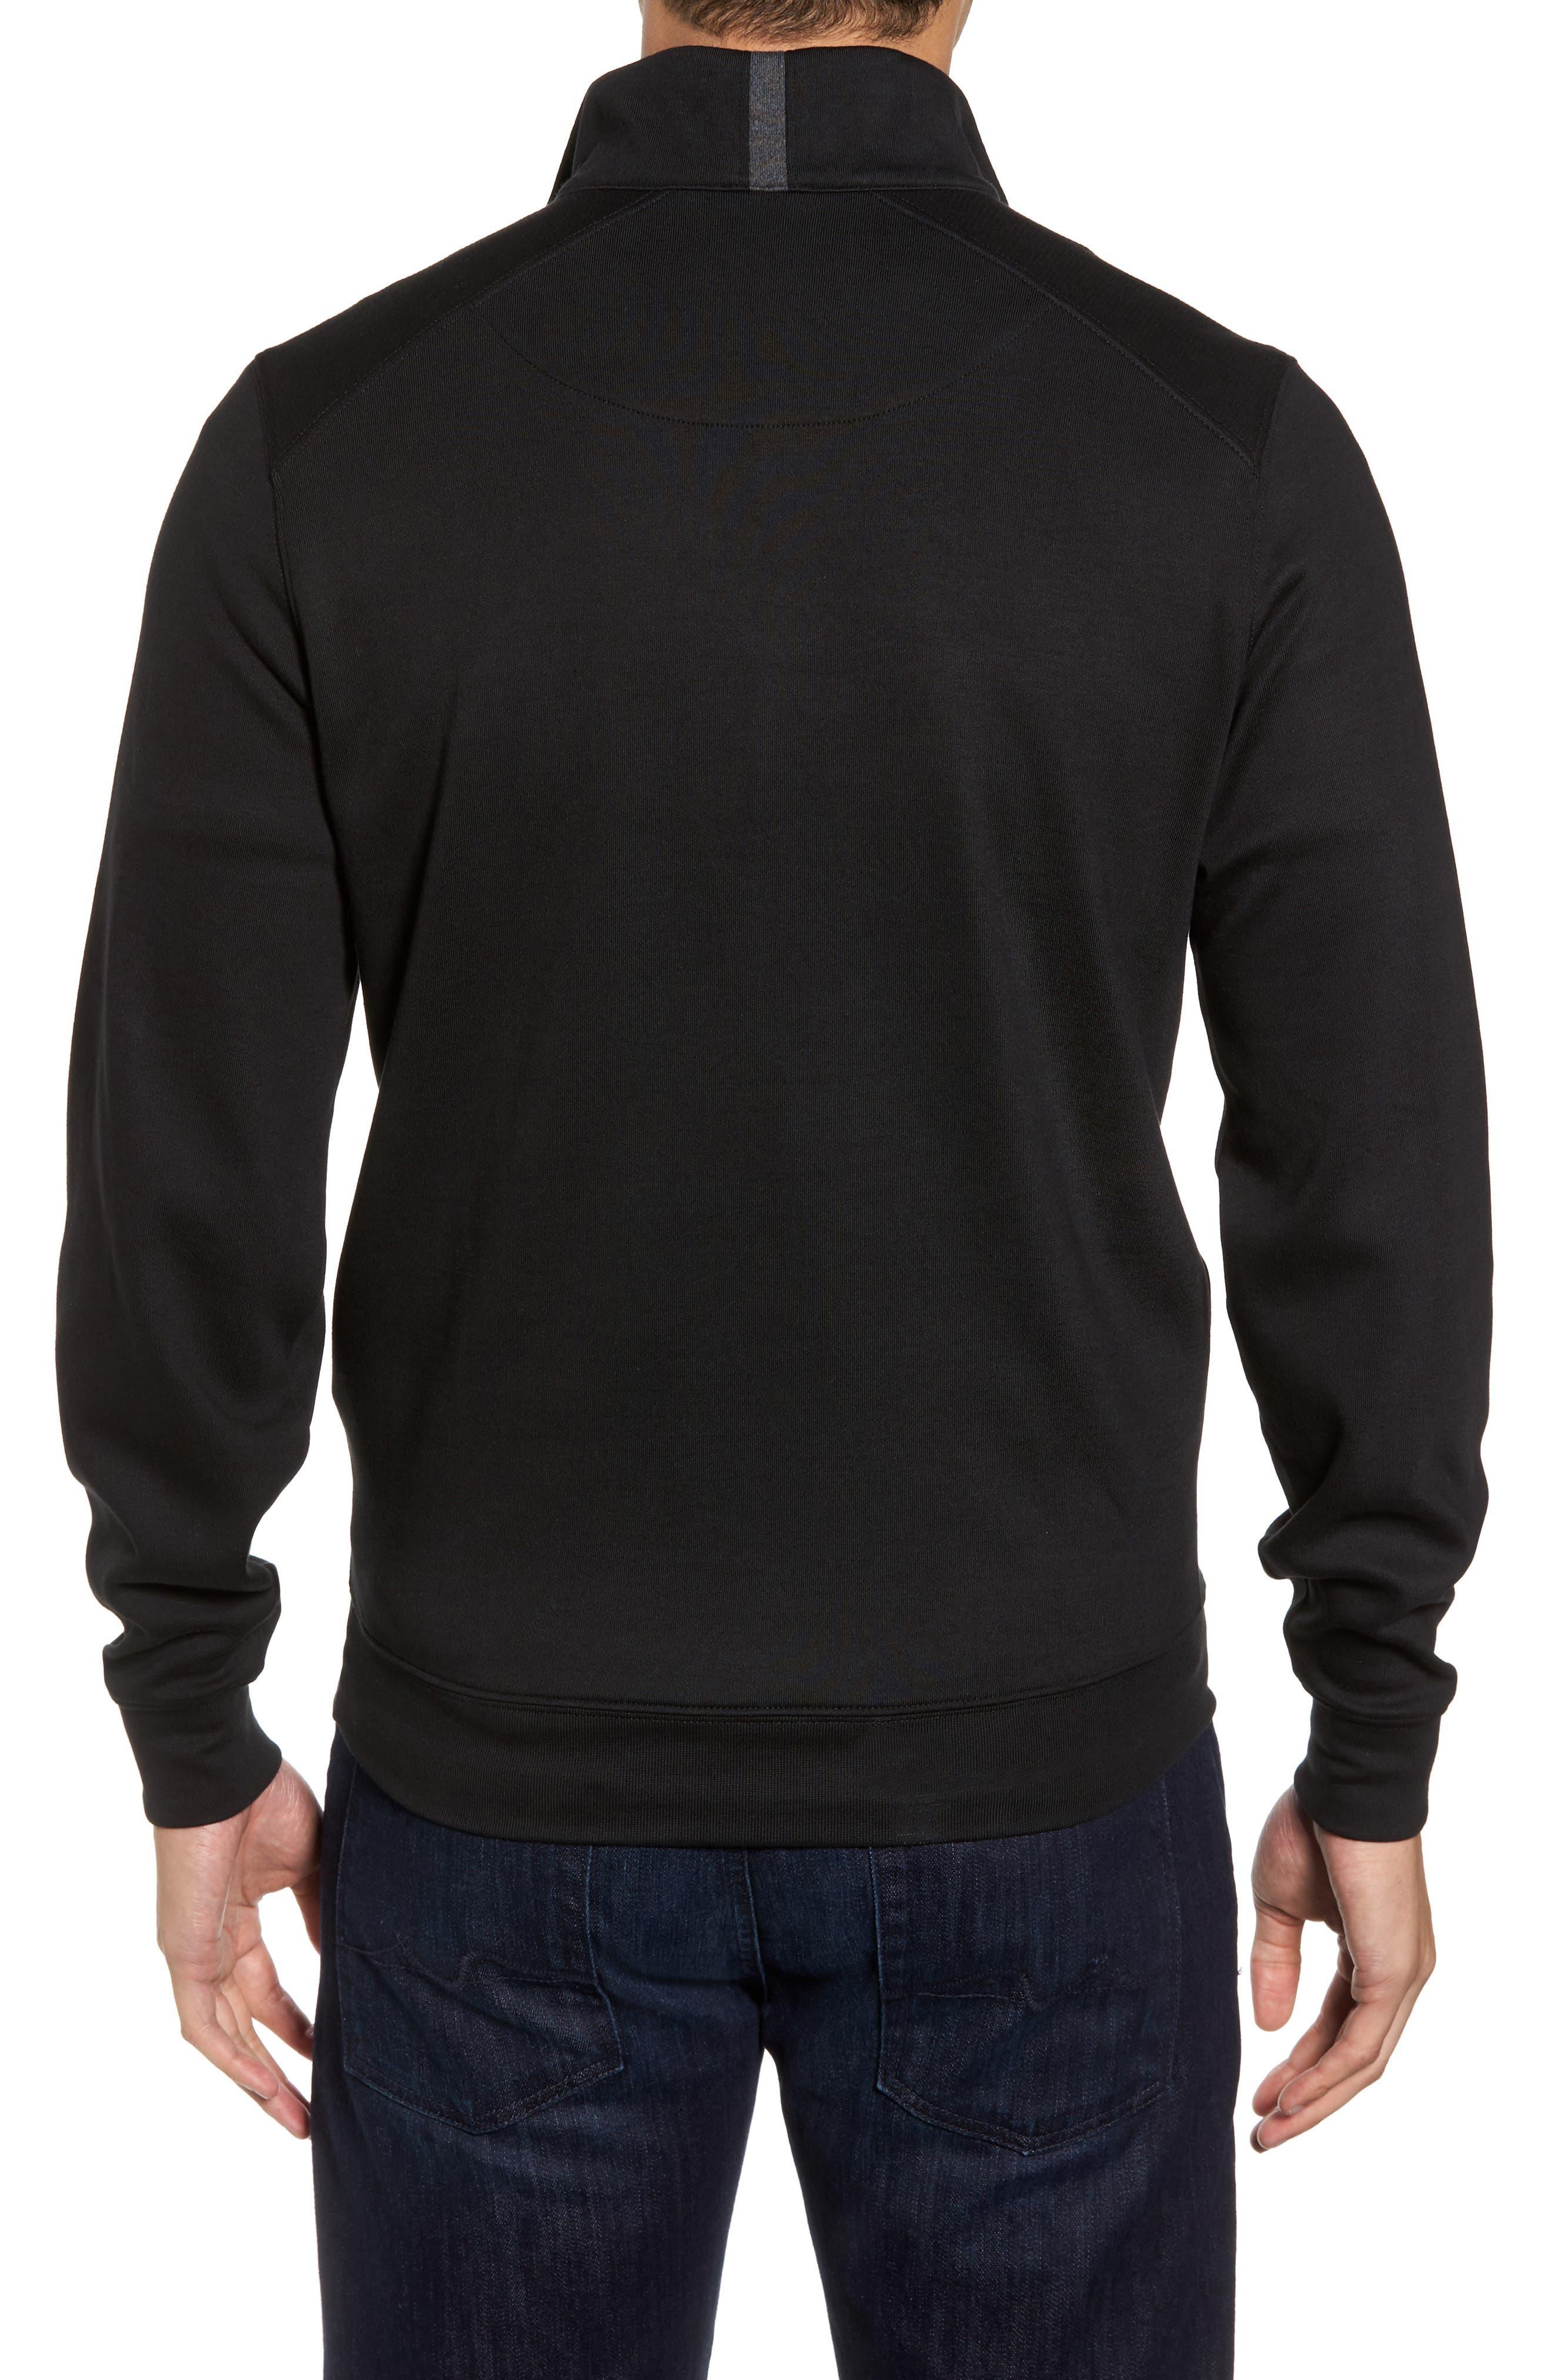 Interlock Knit Quarter Zip Pullover,                             Alternate thumbnail 2, color,                             Black